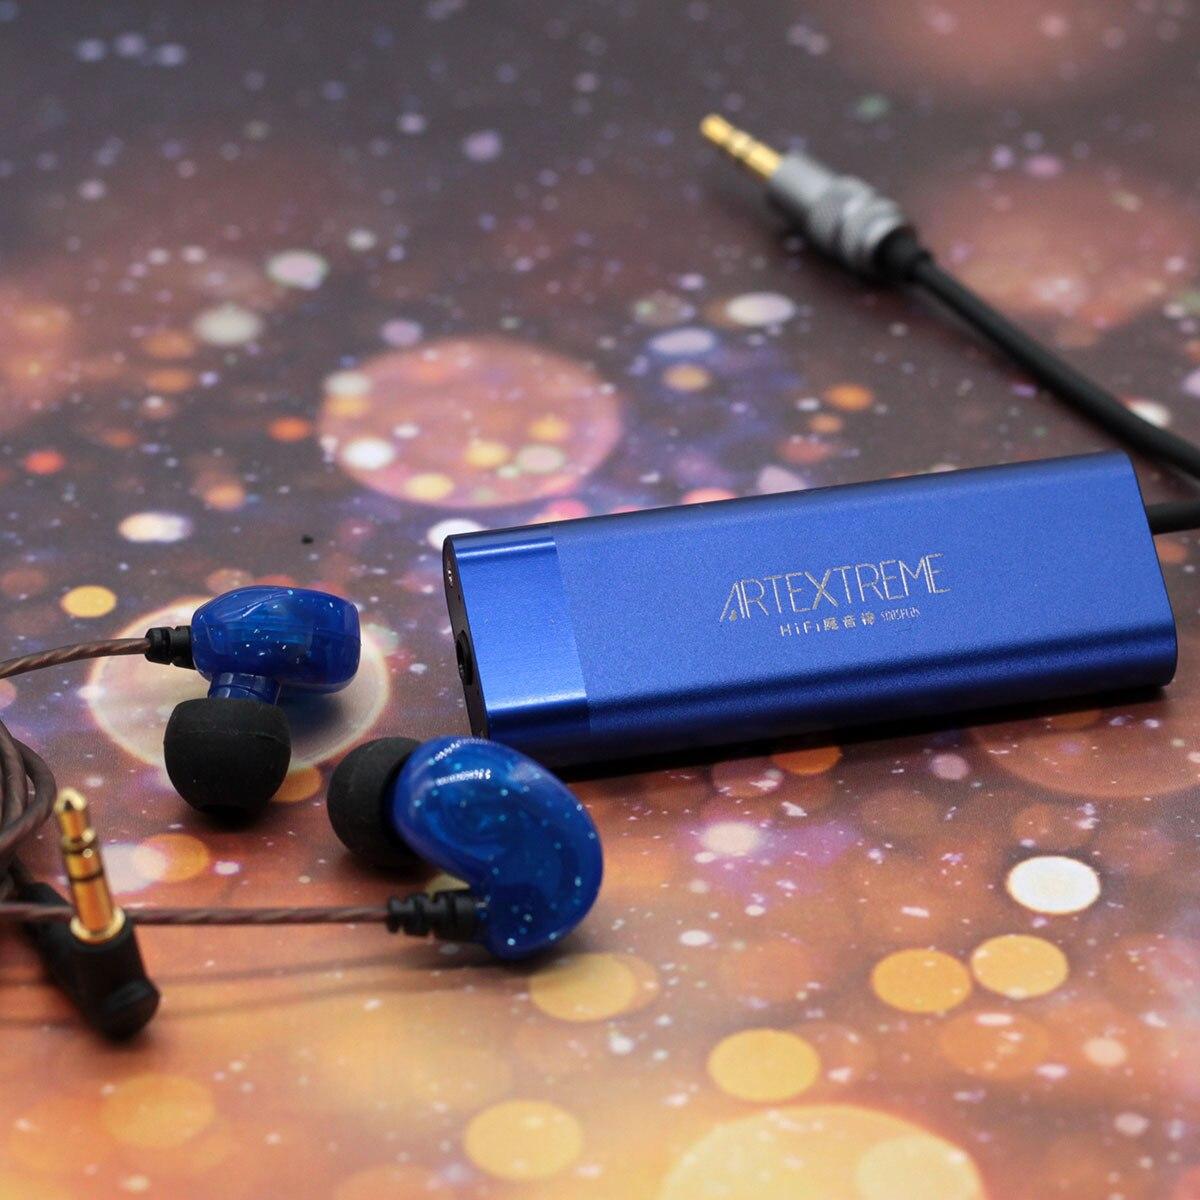 HIFI mobile phone earphone audio amplifier 3 5mm TYPE C decoding headphone amp audio amplifier in Headphone Amplifier from Consumer Electronics